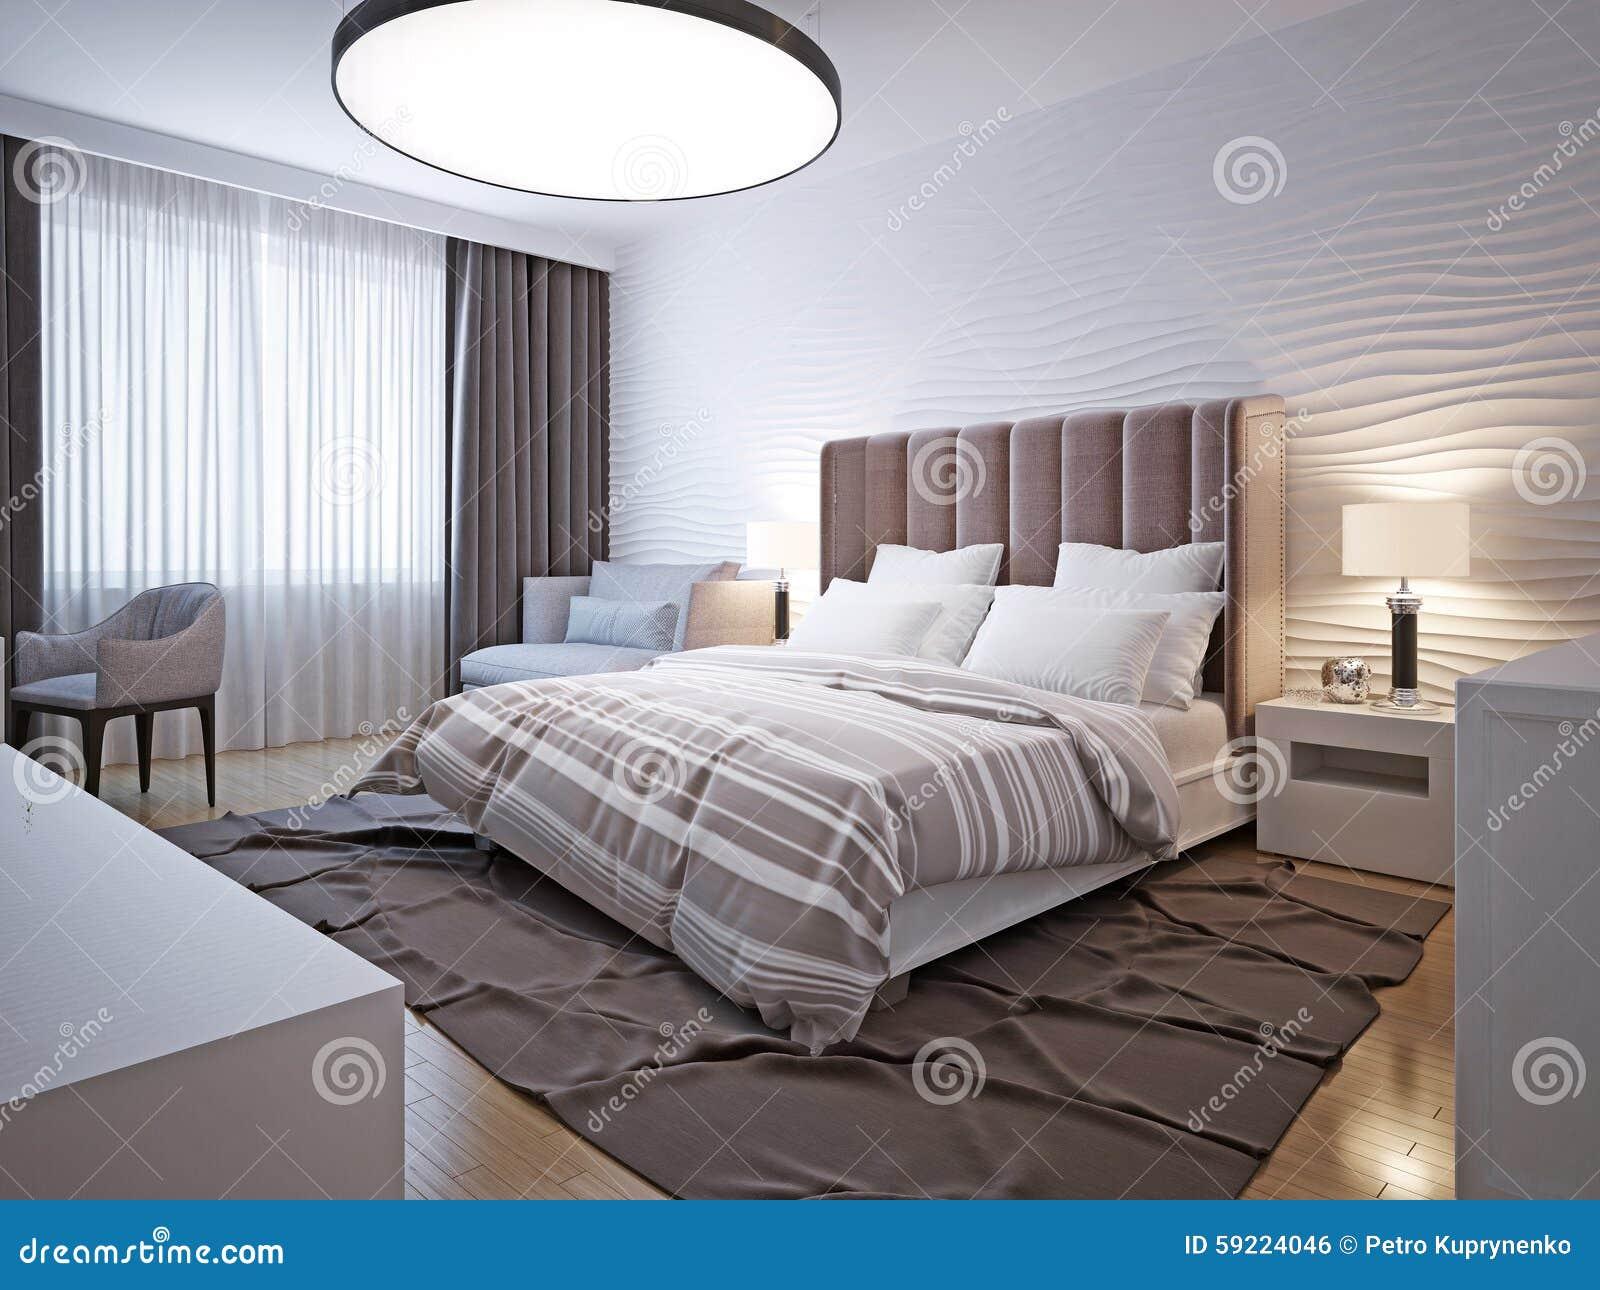 Grote slaapkamer moderne stijl stock foto afbeelding 59224046 - Slaapkamer stijl ...